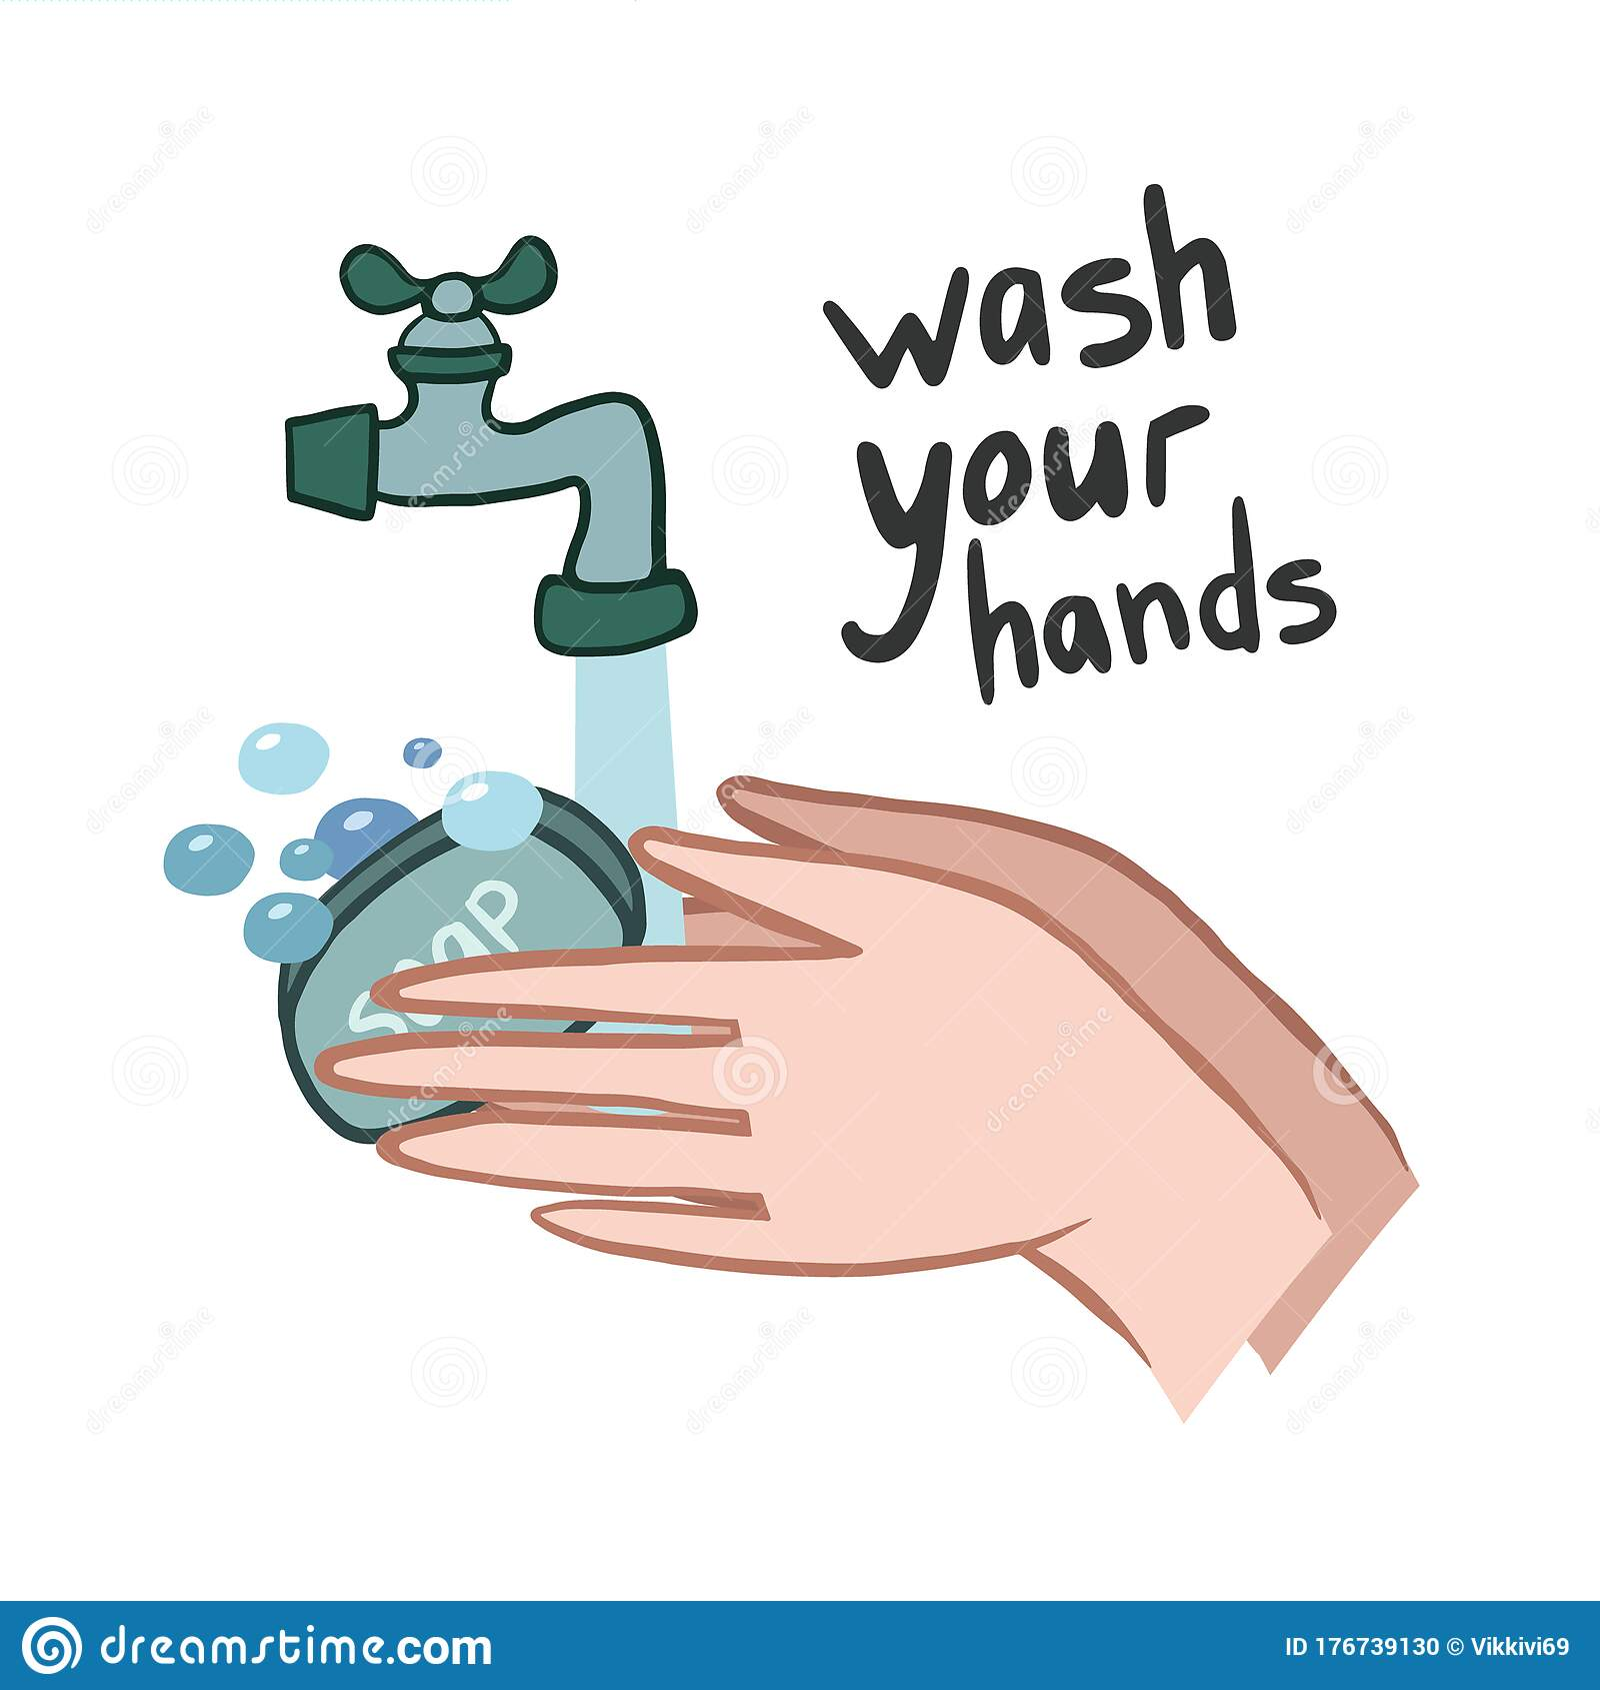 Cartoon Wash Hands Stock Illustrations 2 556 Cartoon Wash Hands Stock Illustrations Vectors Clipart Dreamstime